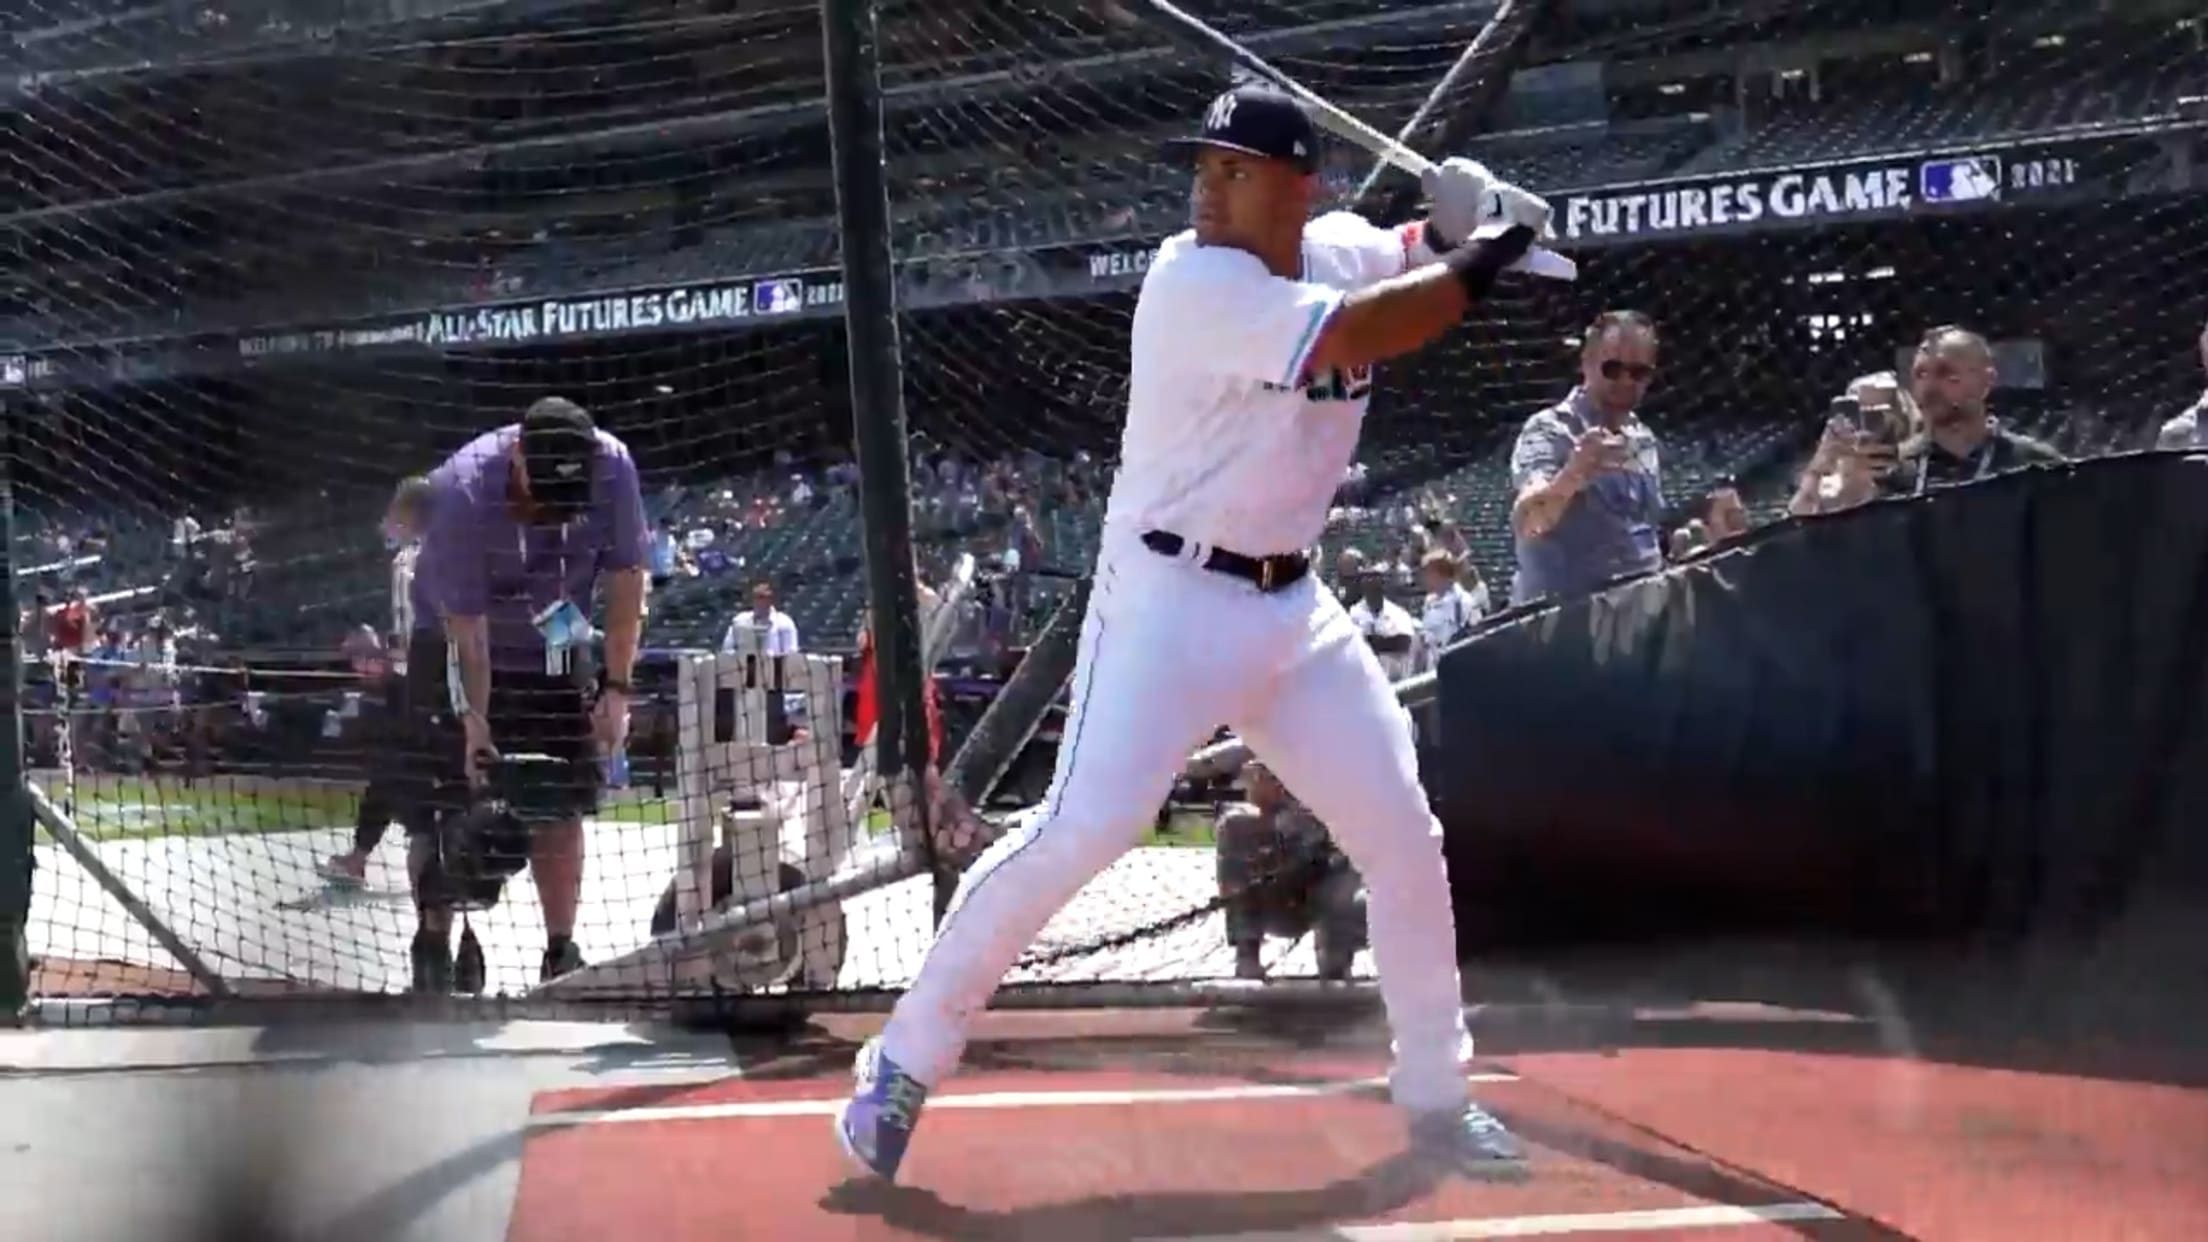 Dominguez takes batting practice